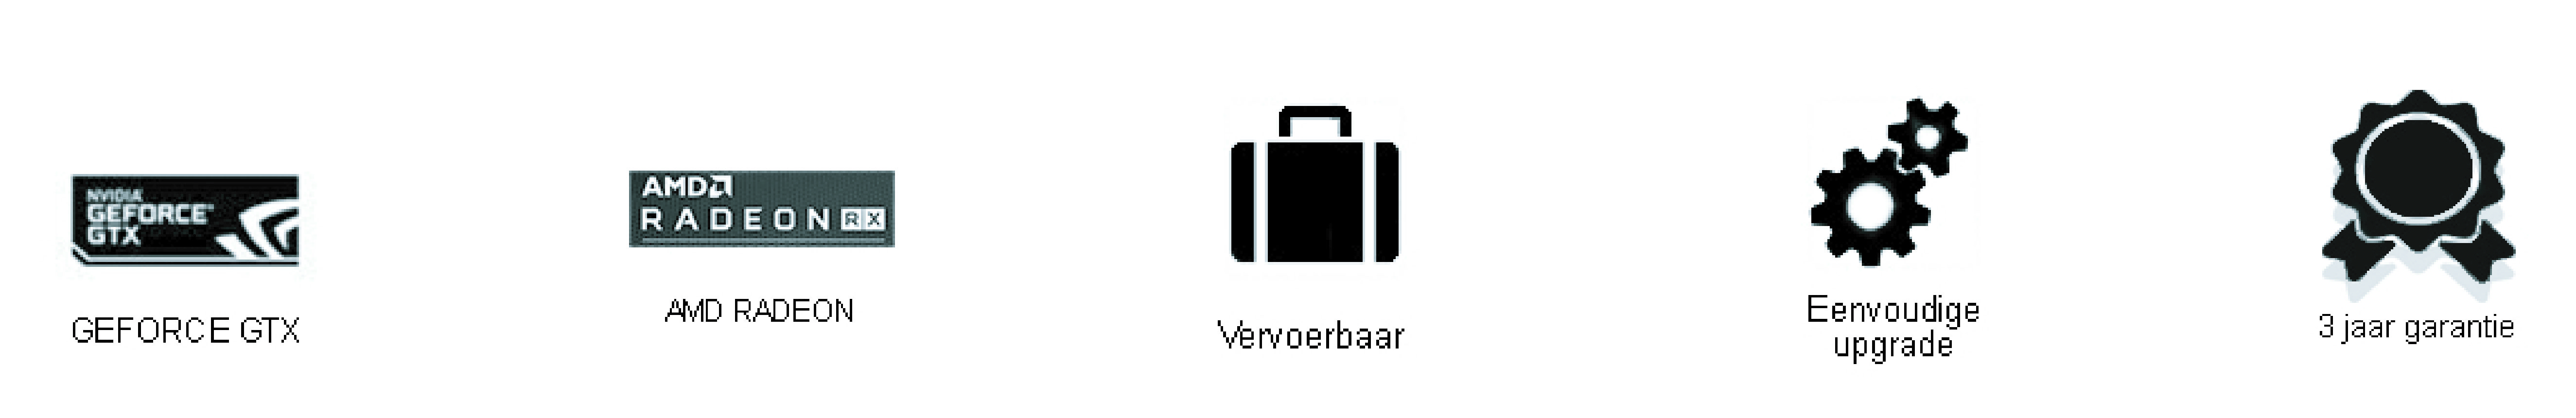 https://www.bleujour.com/wp-content/uploads/2020/06/move-u-bandeau-nl.jpg